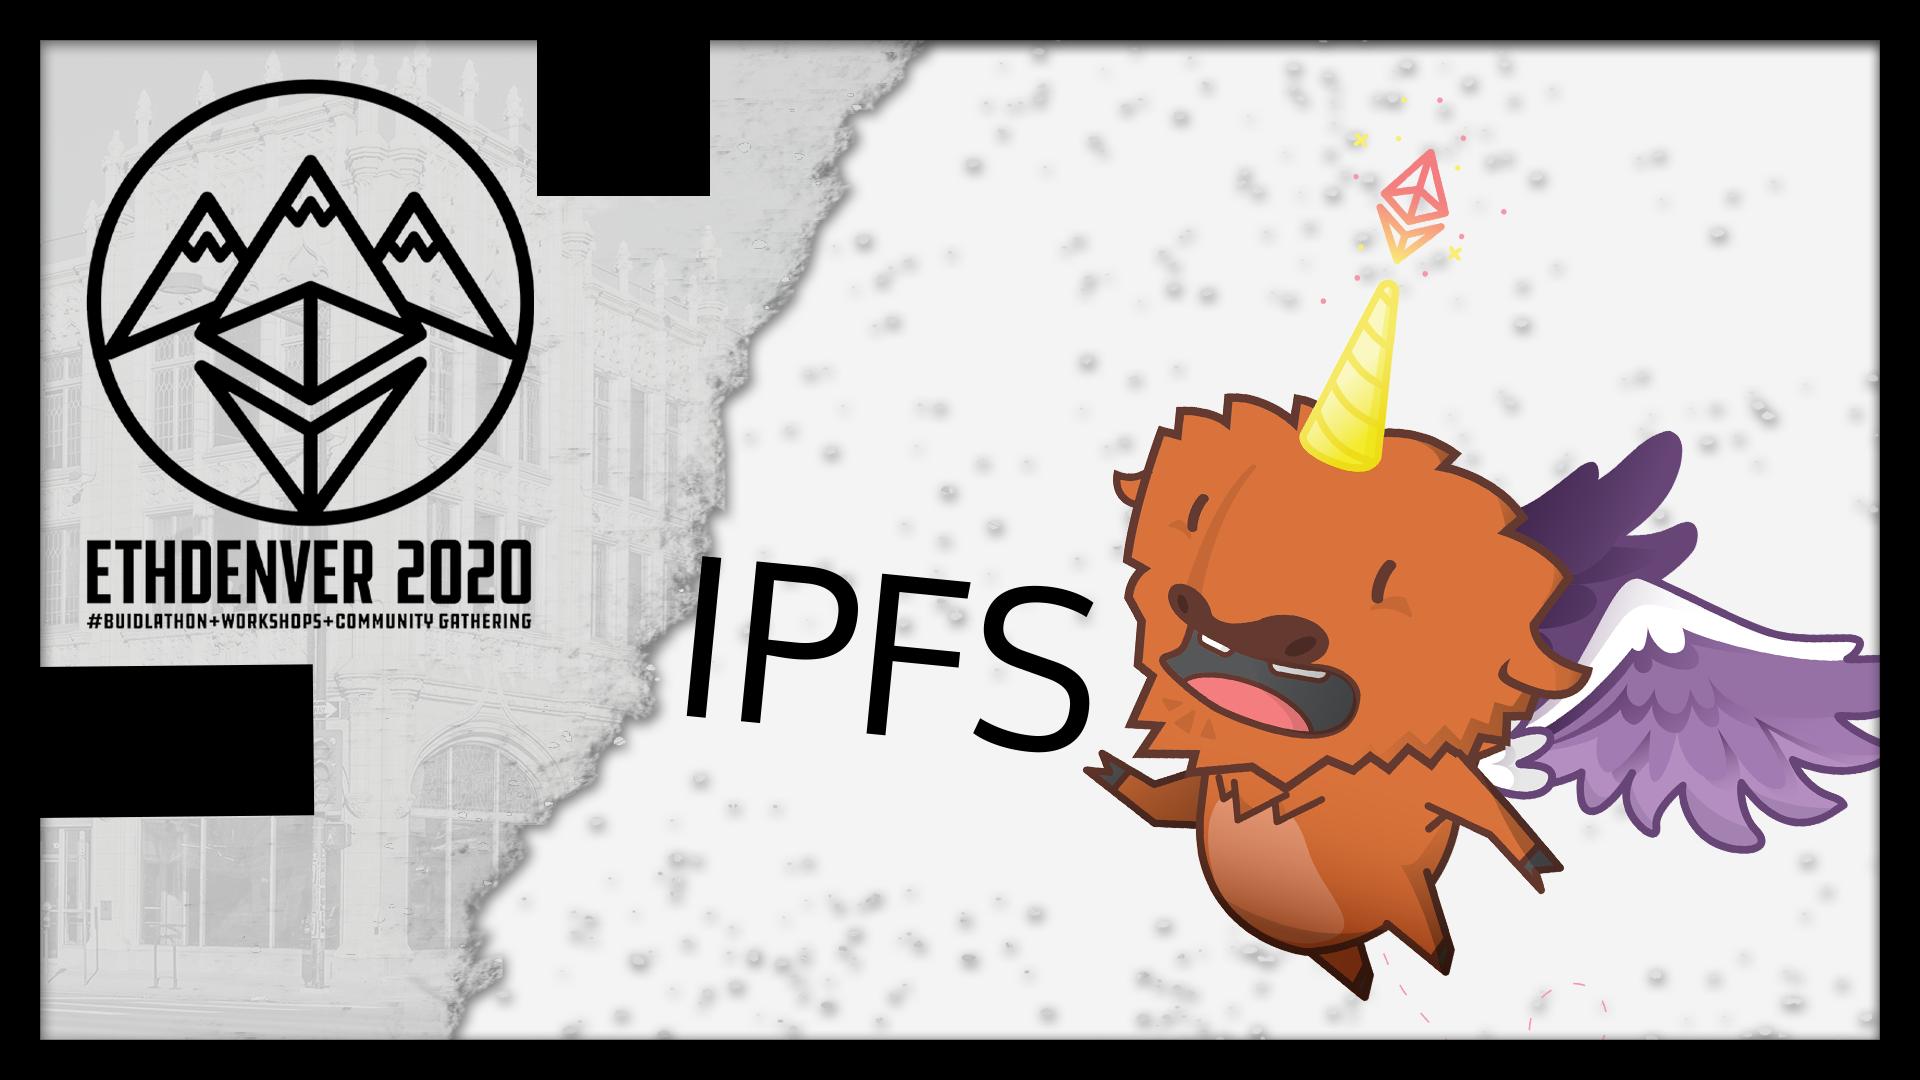 IPFS at ETHDenver 2020